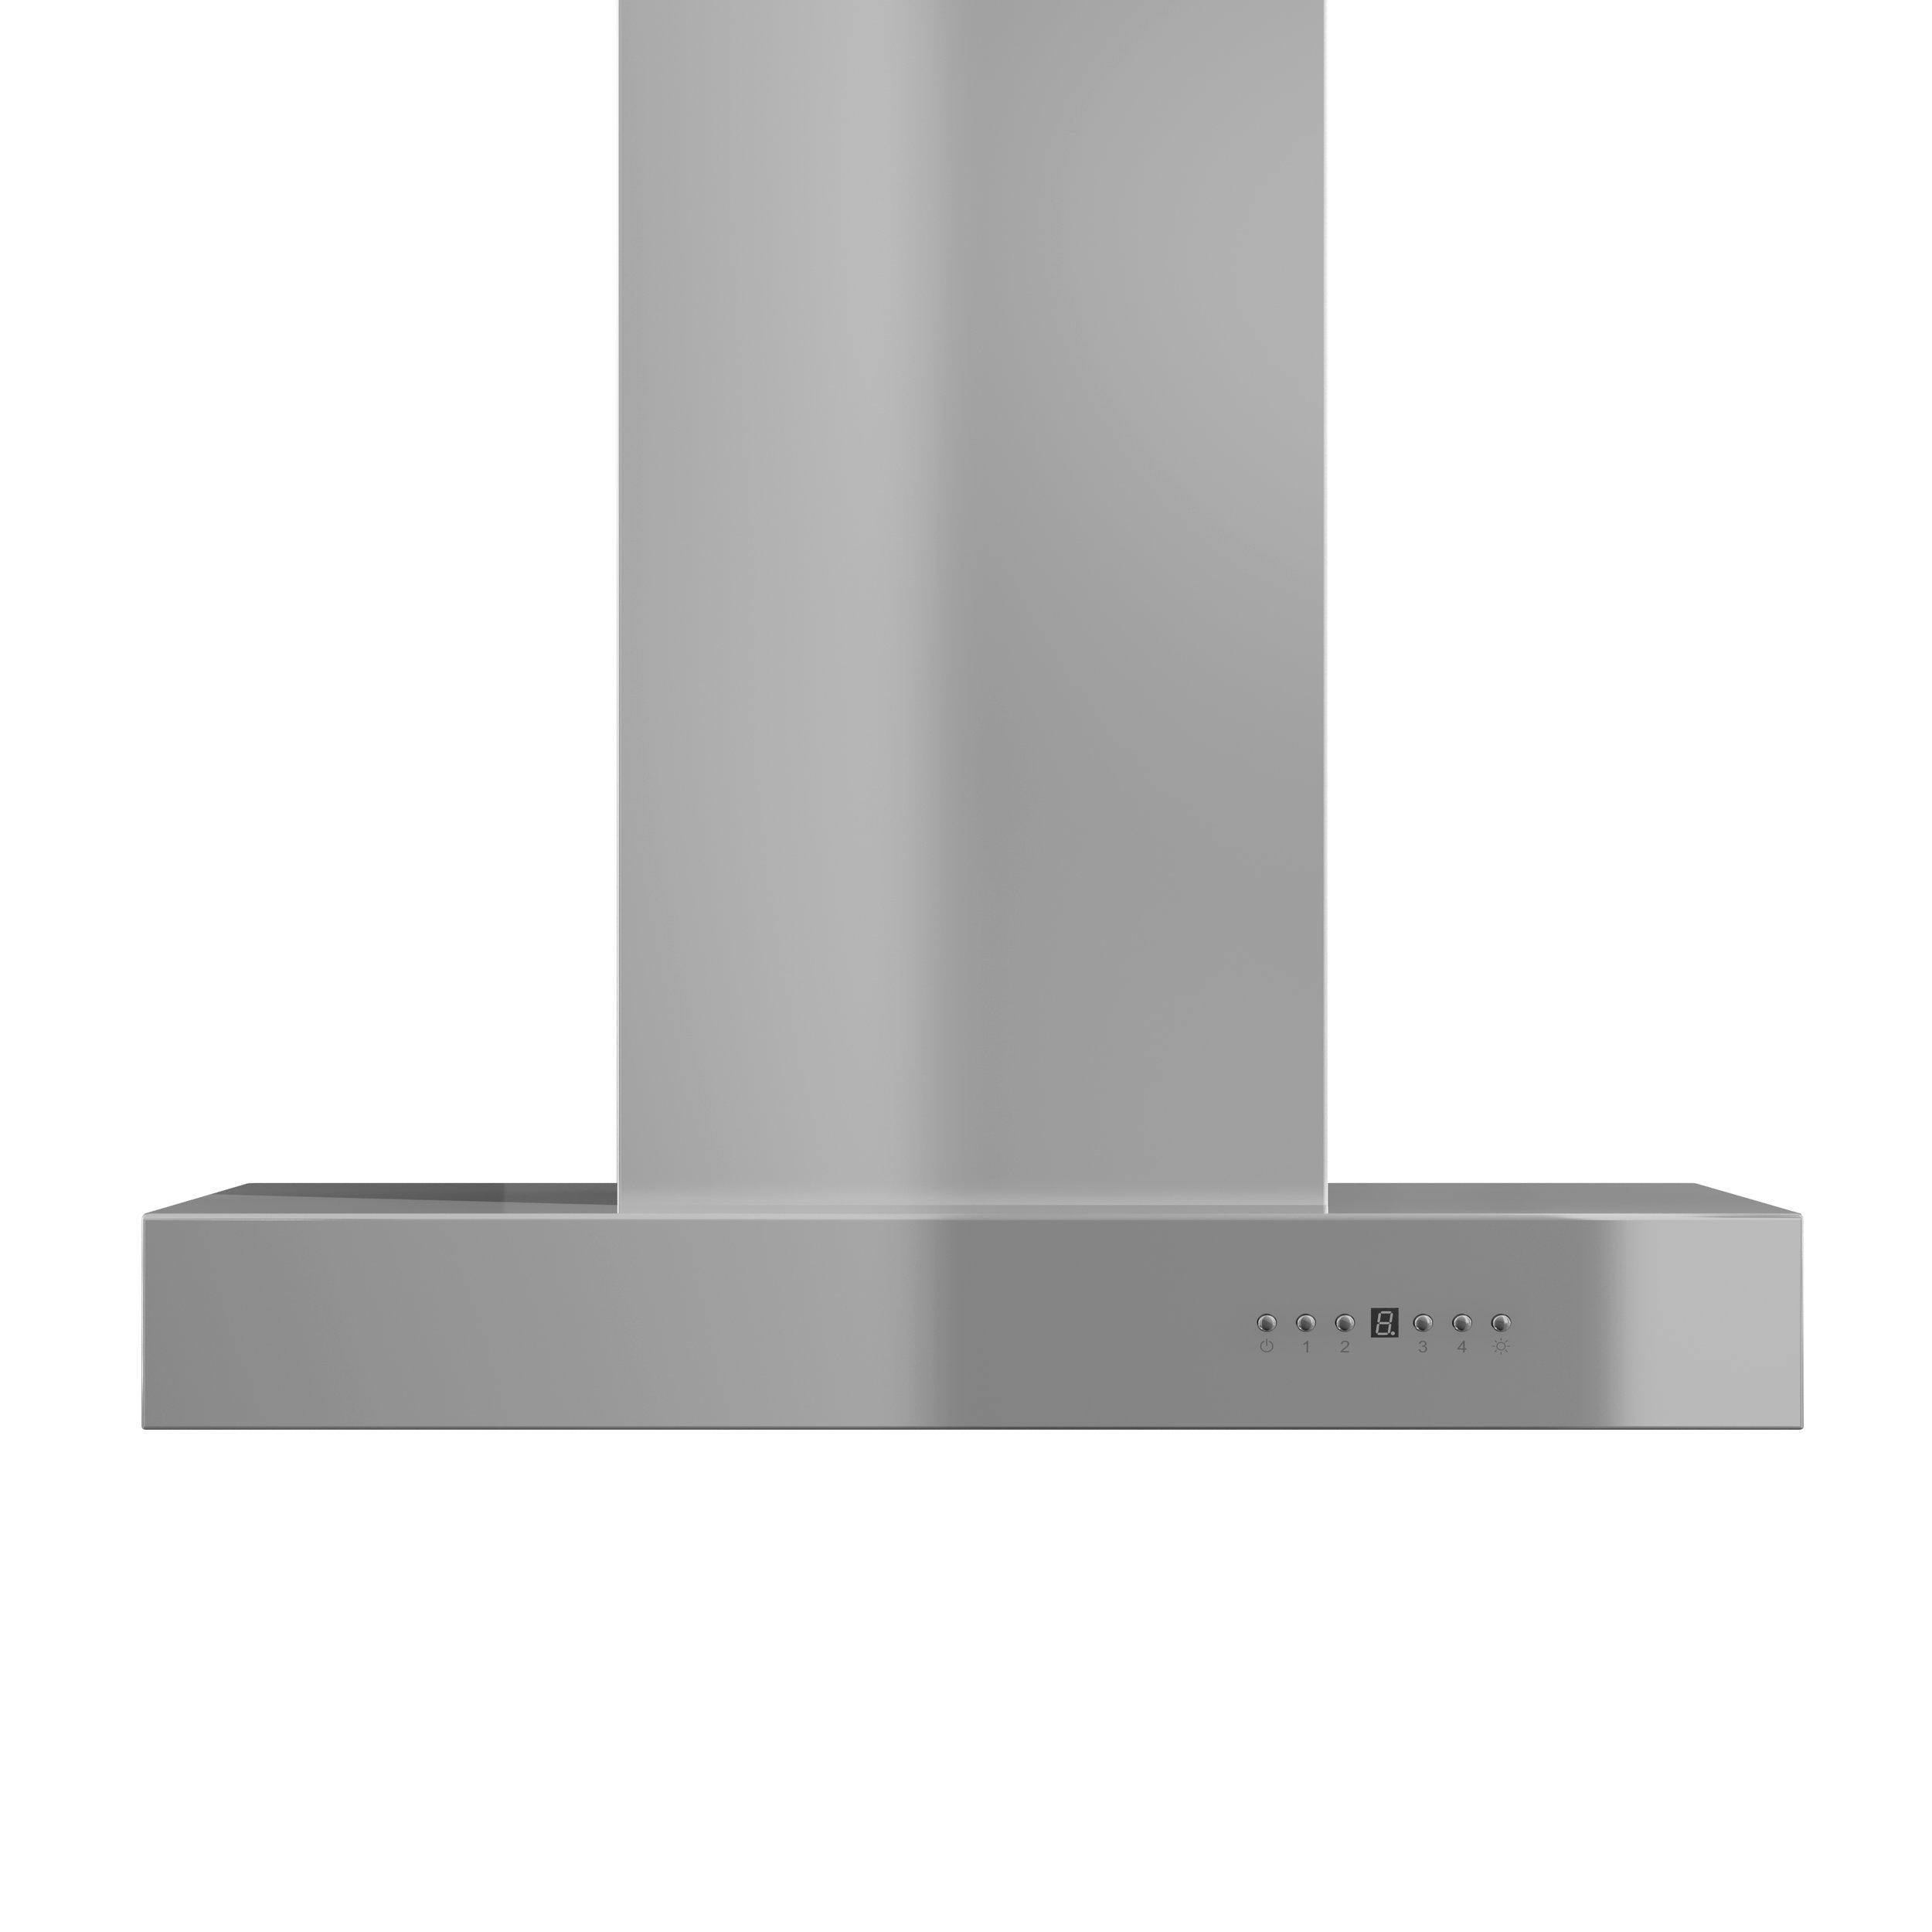 zline-stainless-steel-island-range-hood-KECOMi-front.jpg